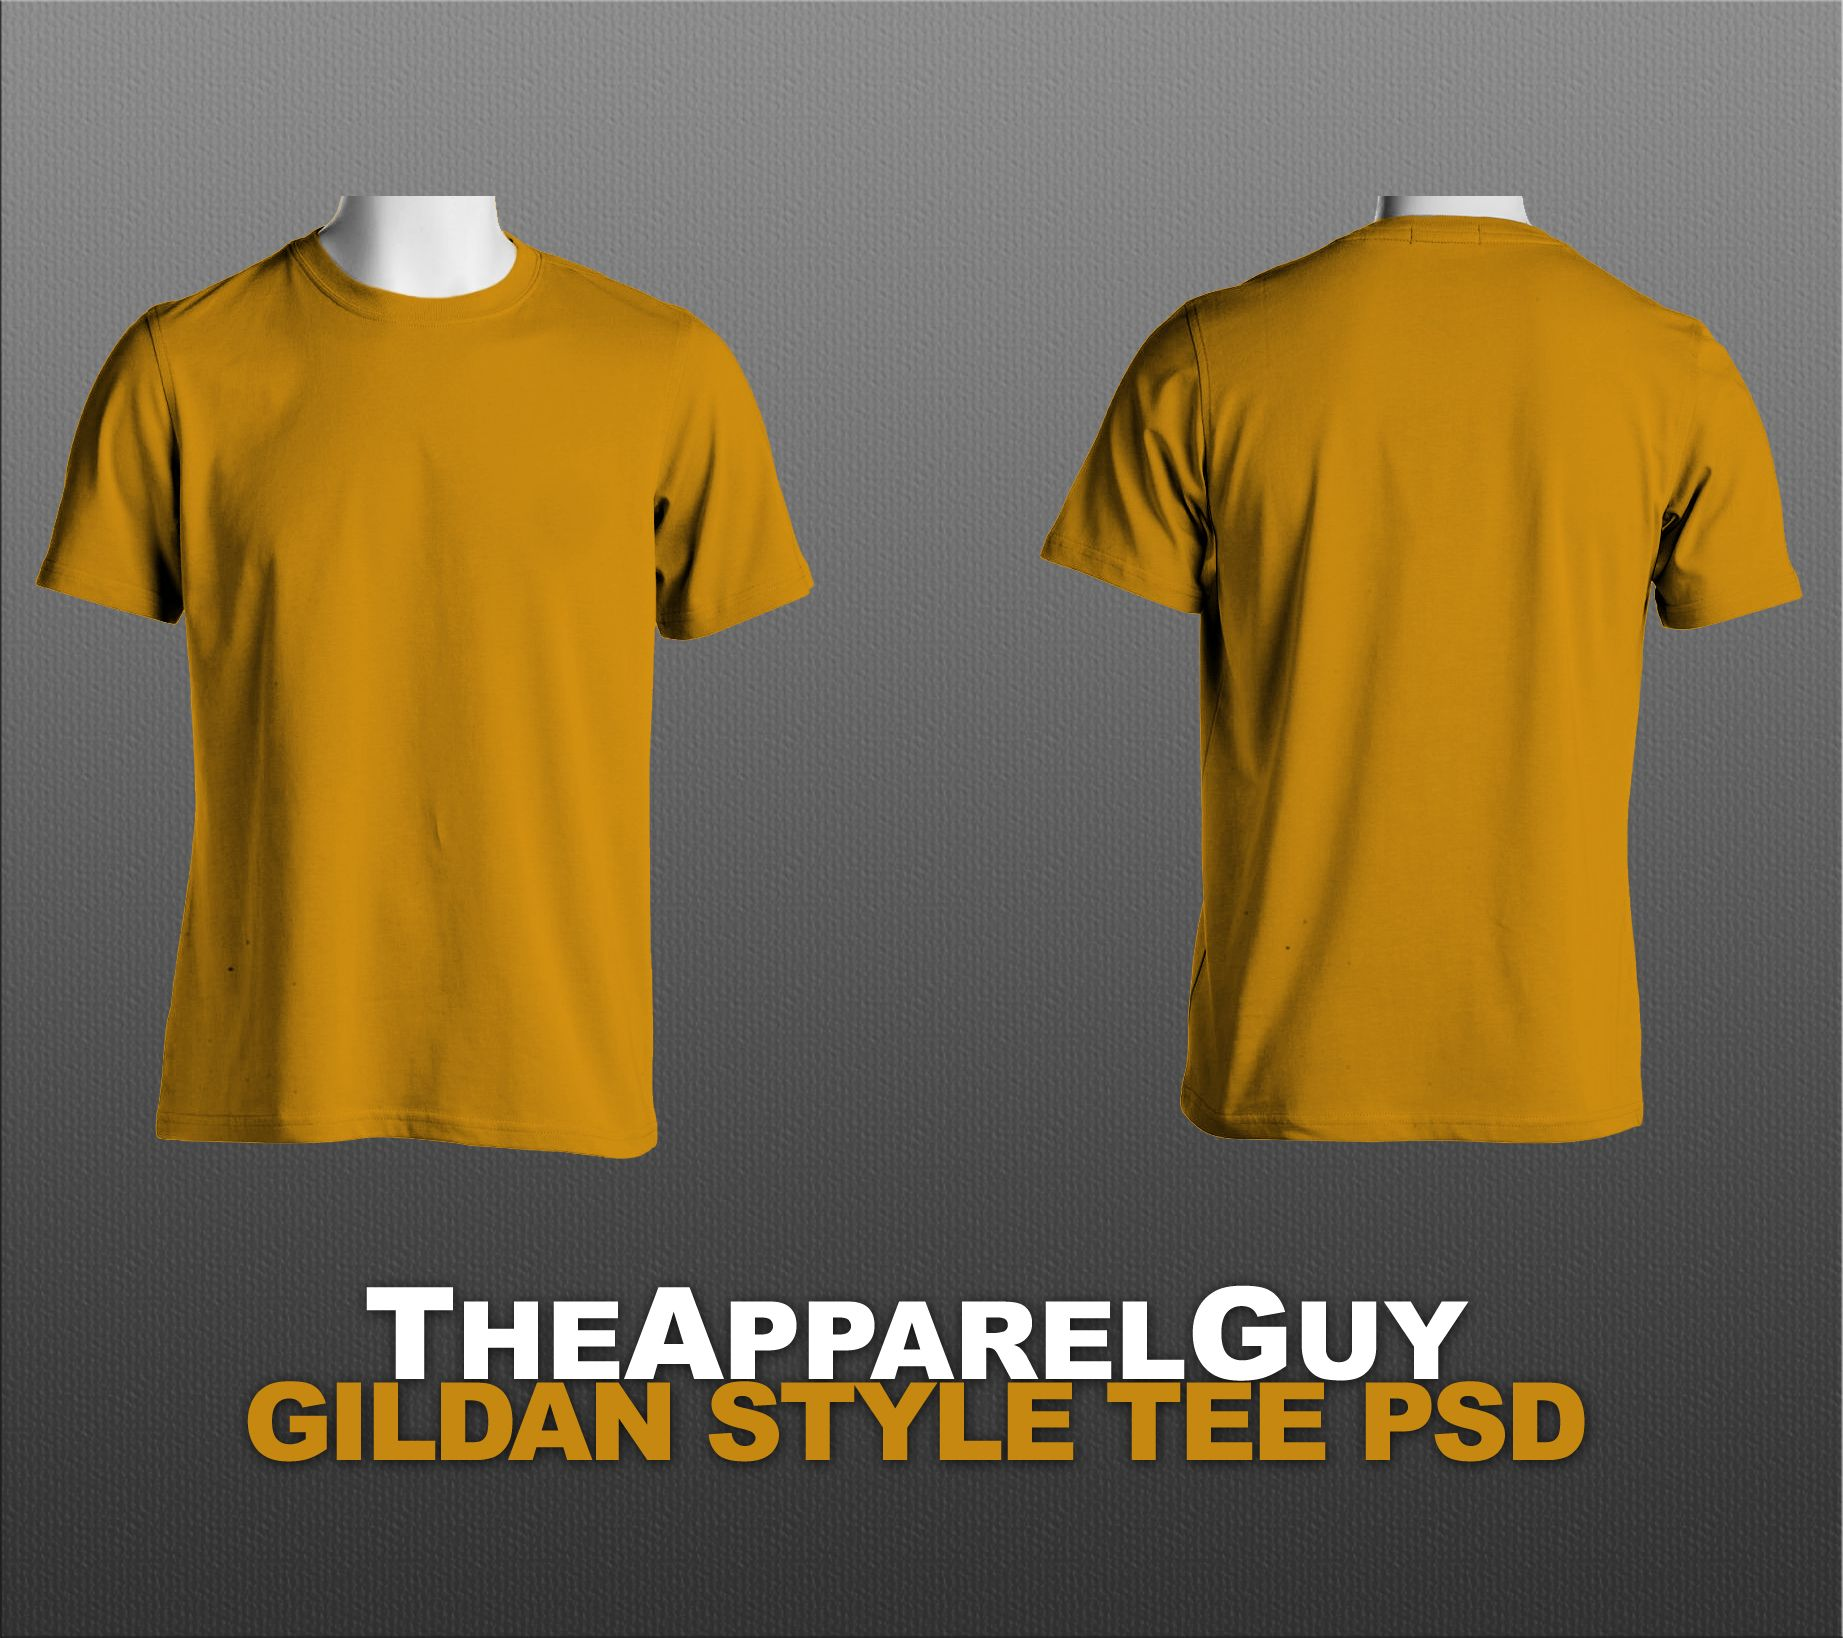 ceb143896 Gildan Style Tee Template PSD by TheApparelGuy.deviantart.com on @DeviantArt